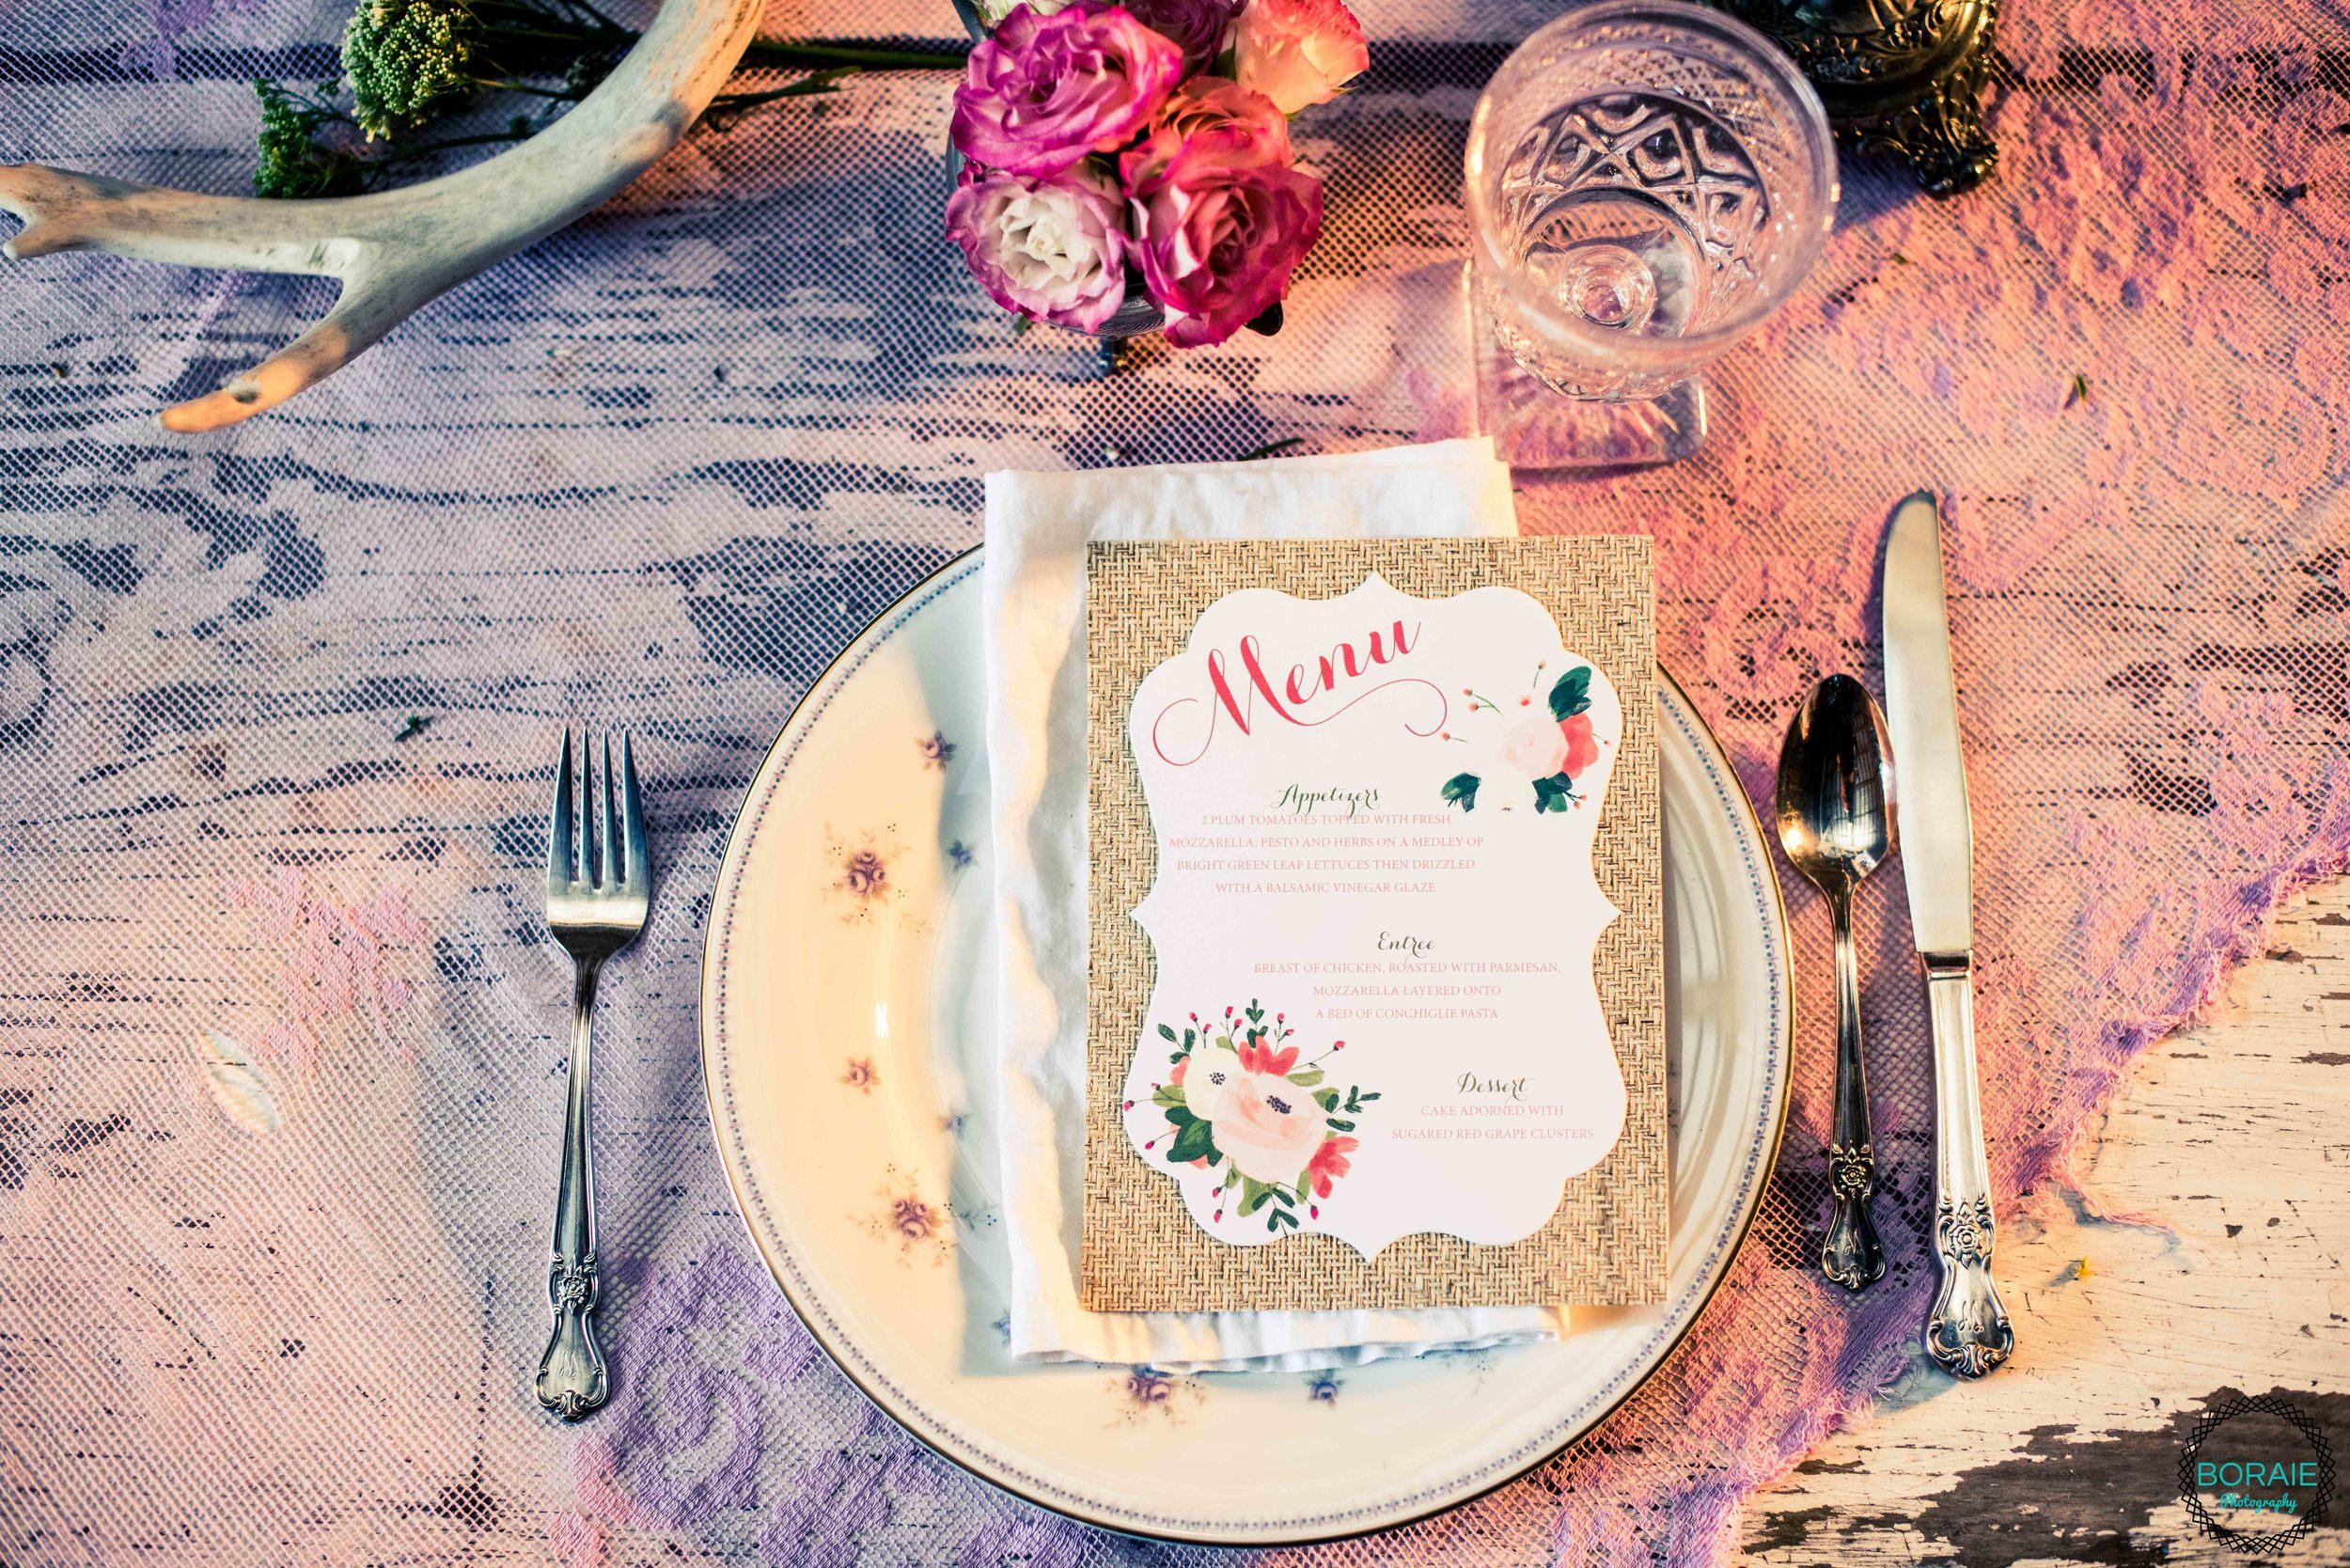 DC, Virginia and Maryland wedding photographer www.boraiephotography.com